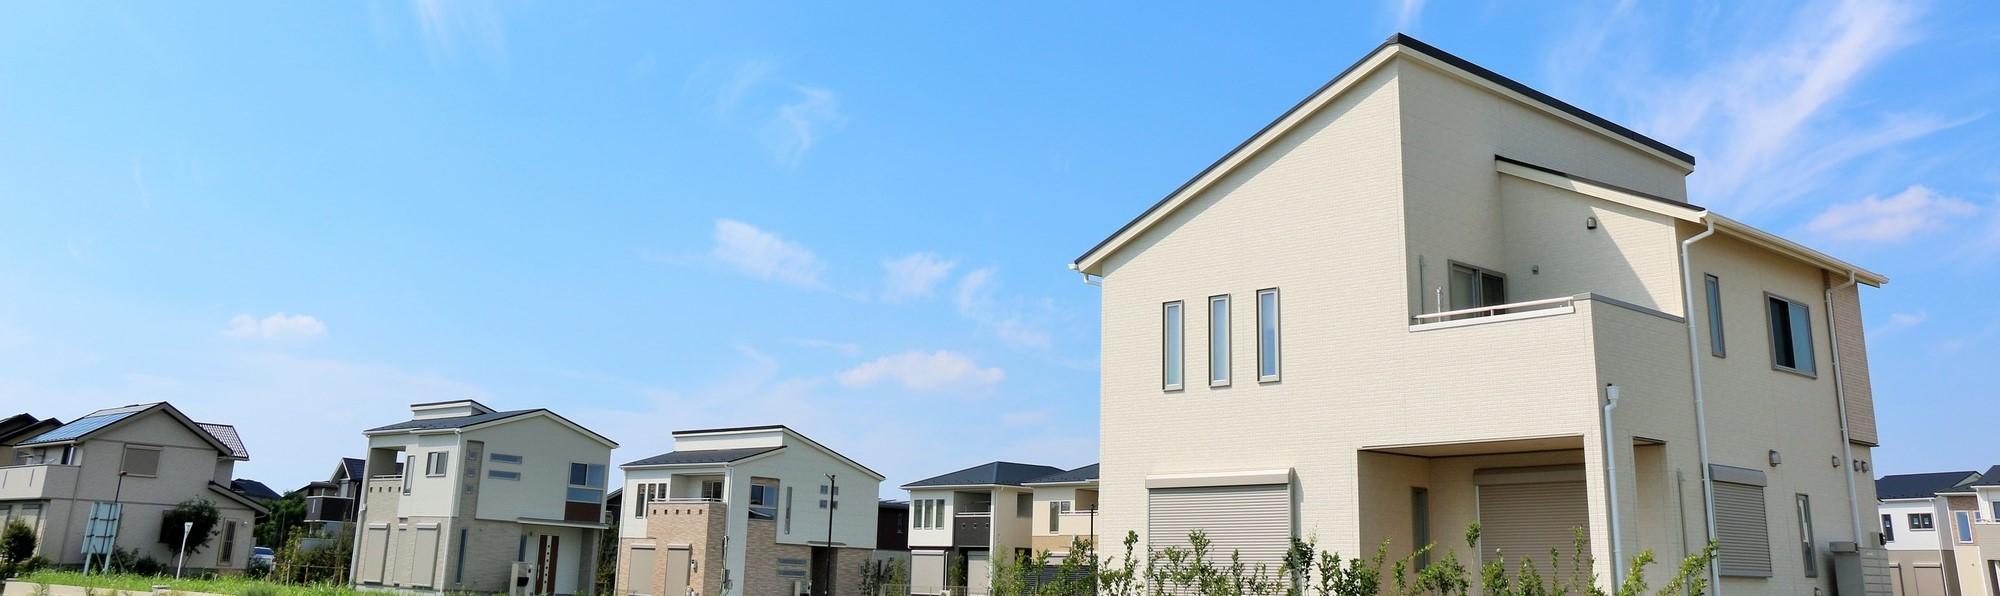 東横線(武蔵小杉・日吉・綱島エリア)に住む!戸建て購入・注文住宅相談会